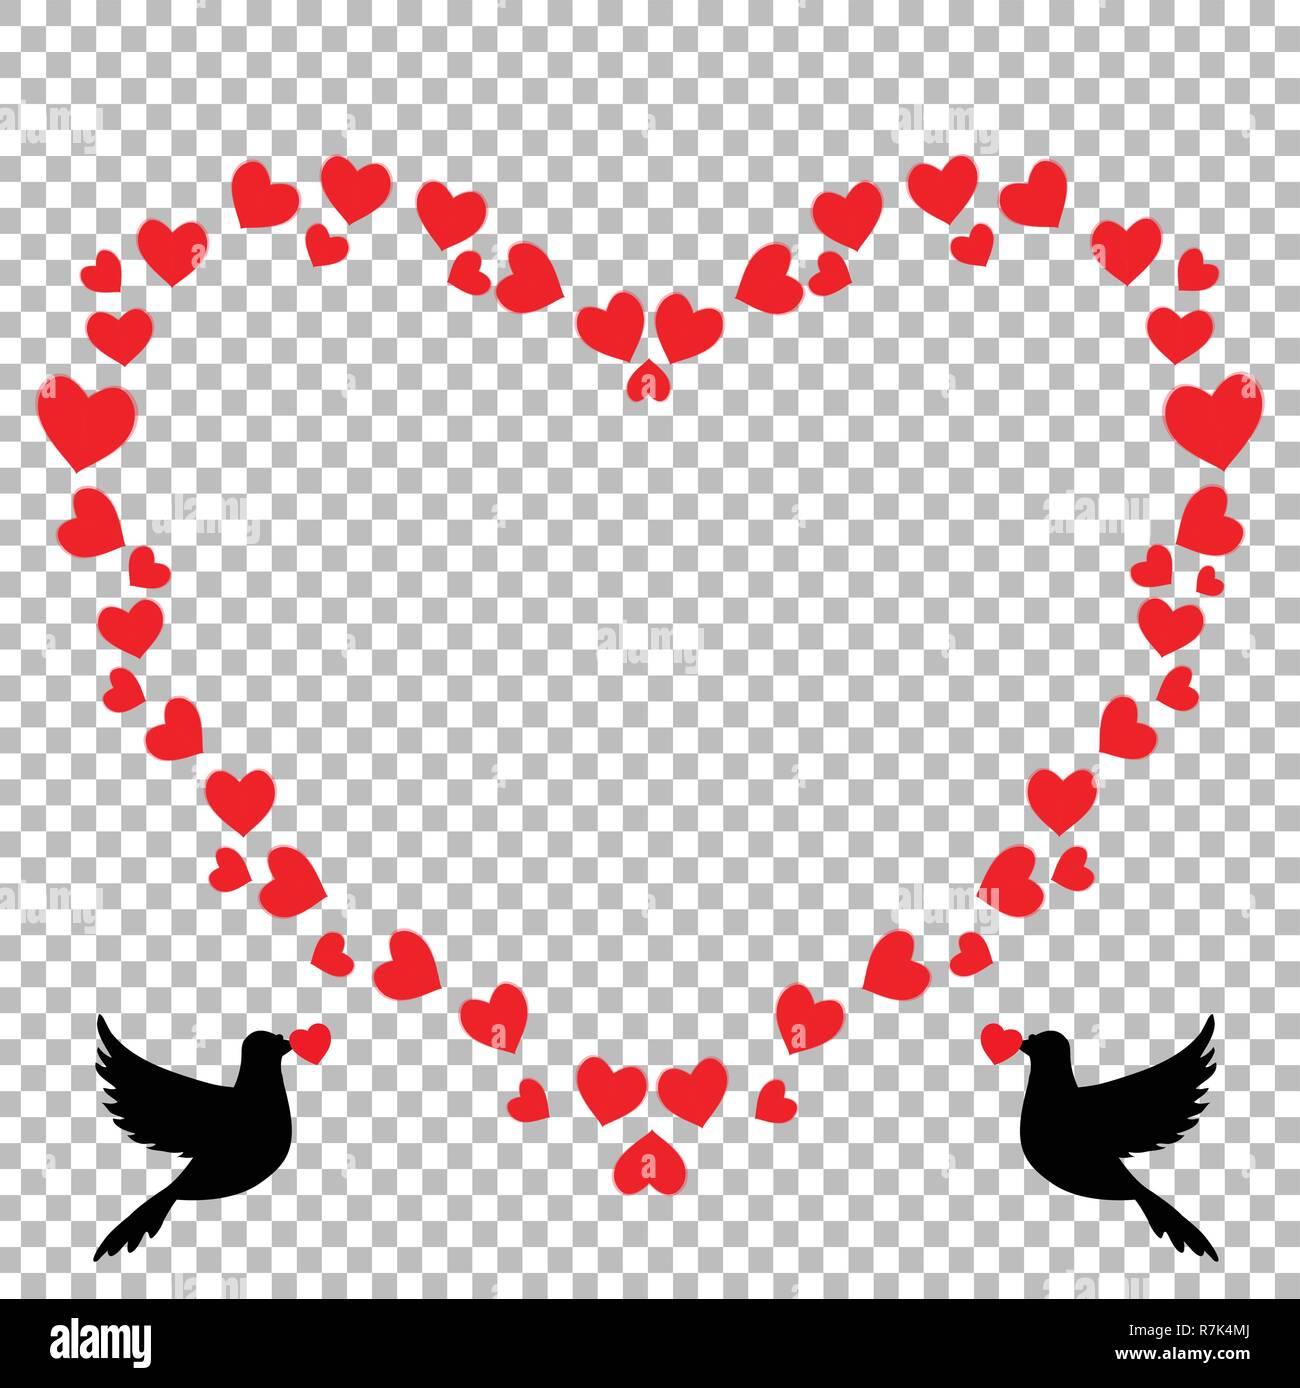 vector red heart shaped retro vintage border photo frame